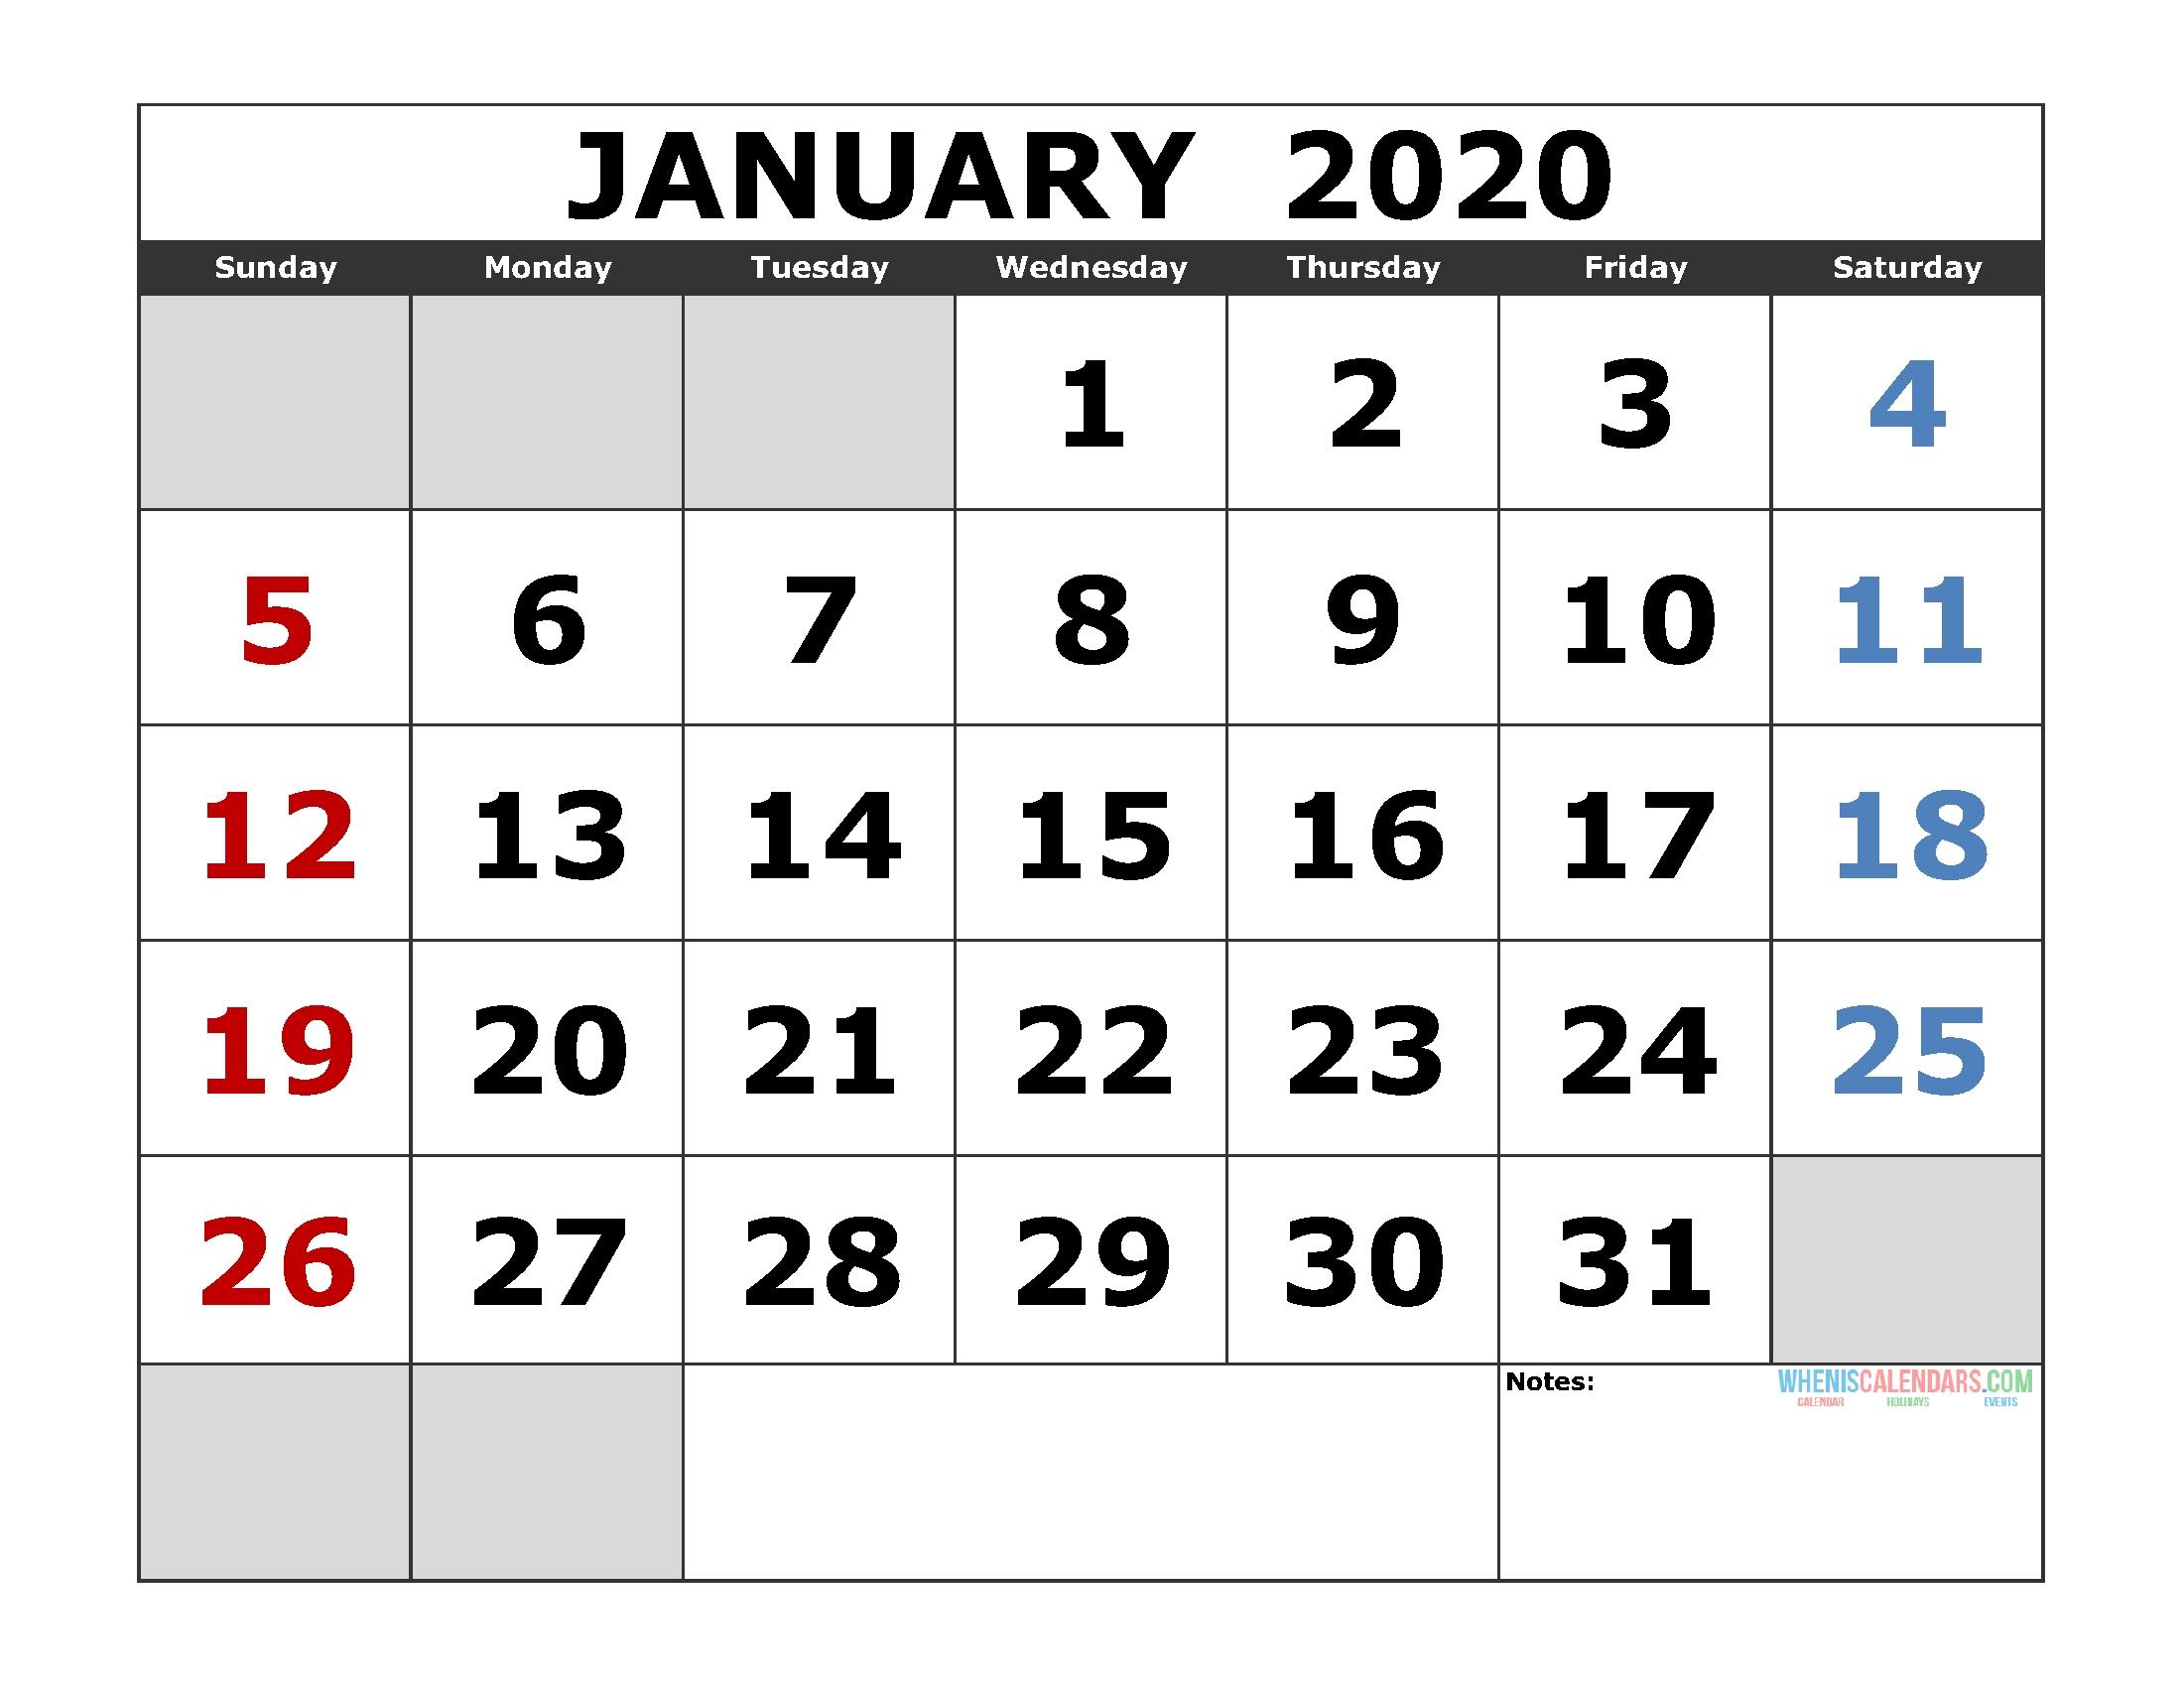 January 2020 Printable Calendar Template Excel, Pdf, Image-January 2020 Calendar Events